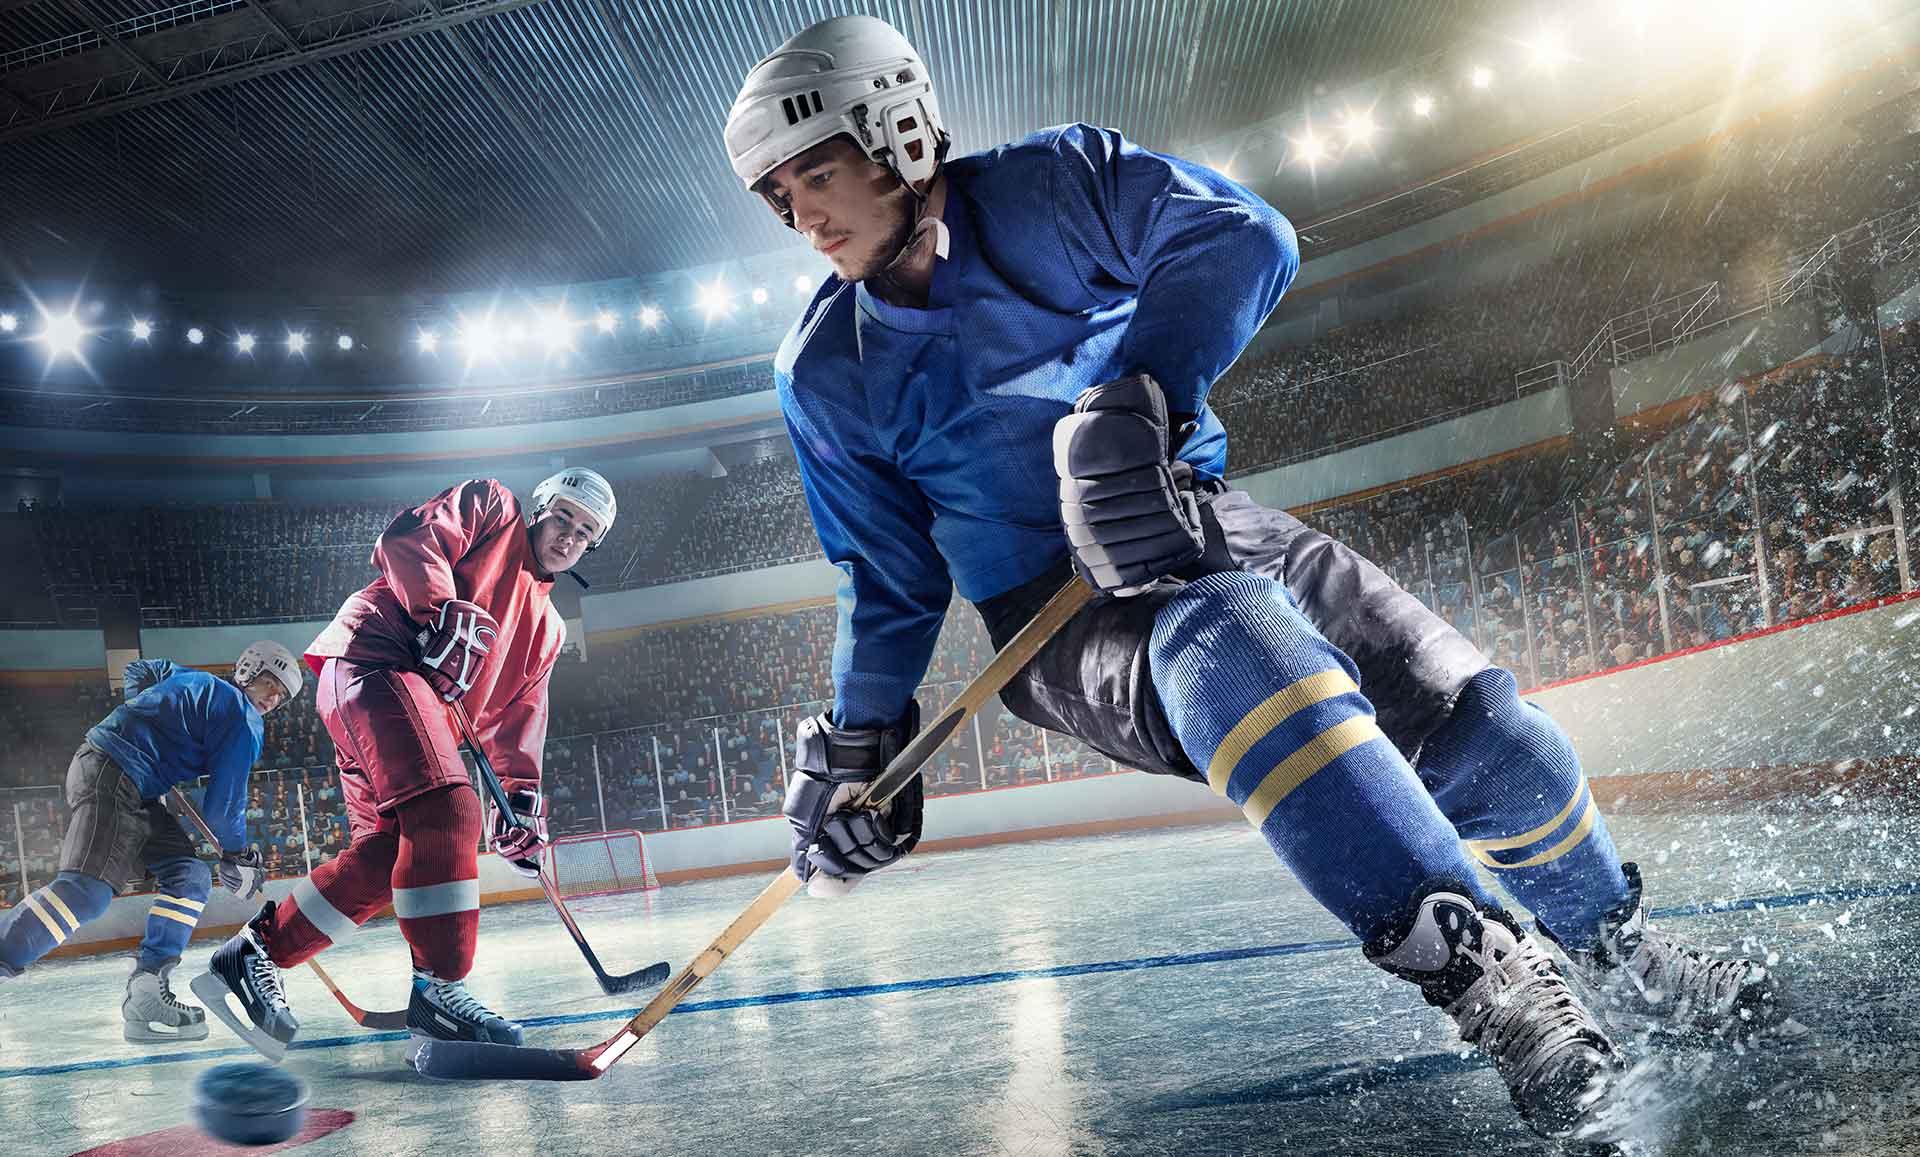 Oha Uk Successful In European Tour Okanagan Hockey Uk